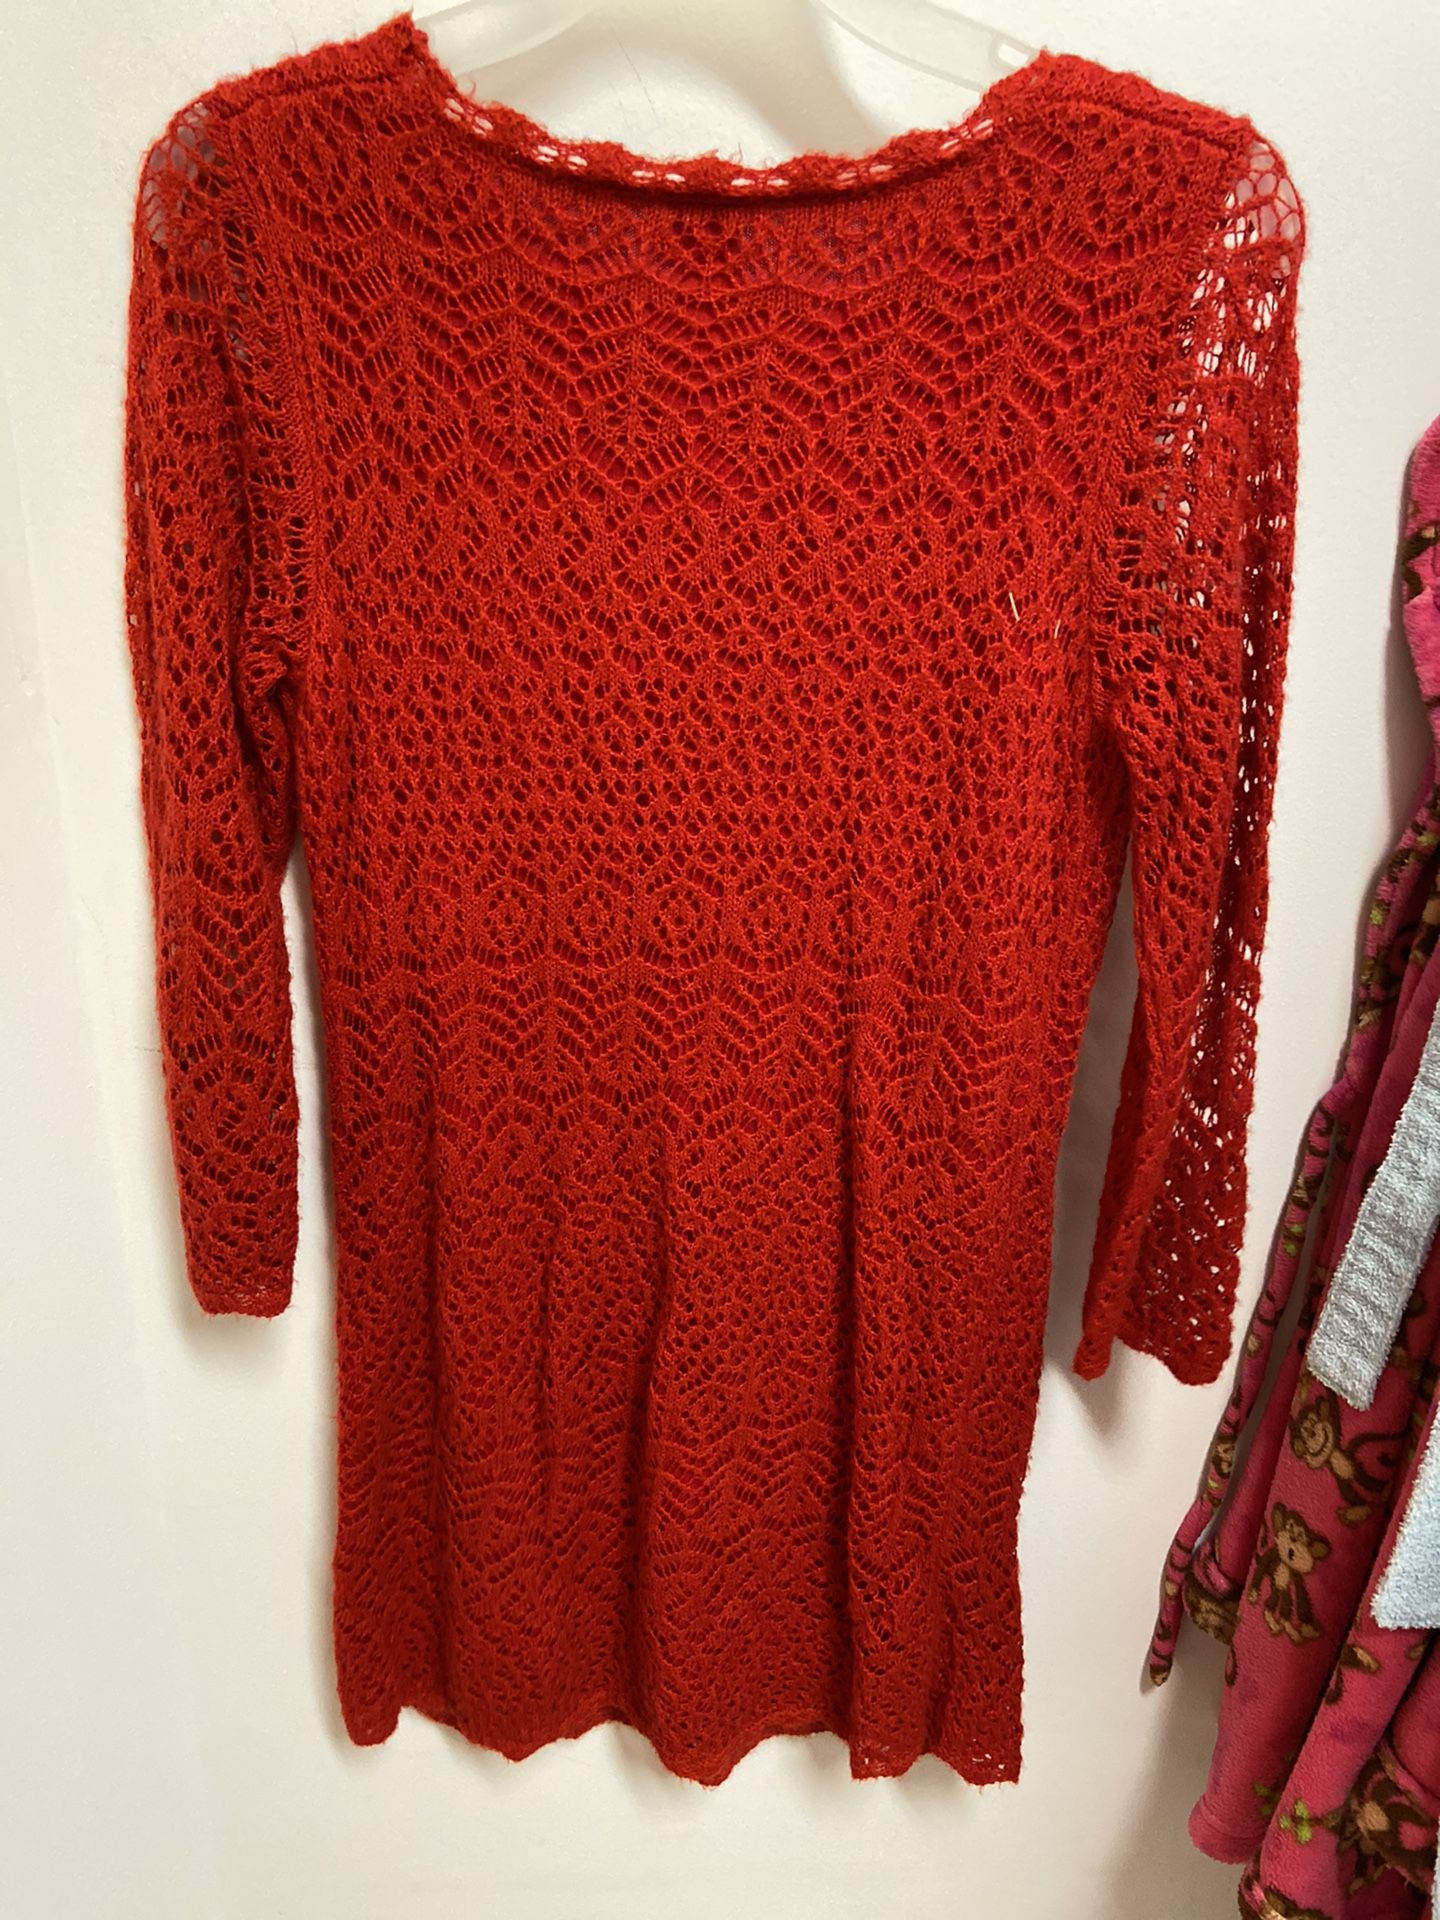 Cat & Jack red long sleeve dress, size 14/16 girls